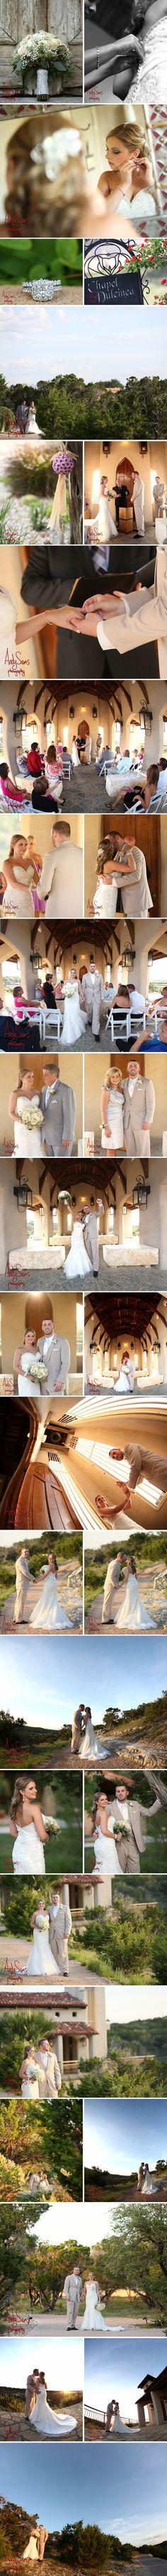 Michelle + Chris | Intimate Chapel Dulcinea Ceremony | Austin Wedding Photographer | Andy Sams Photography